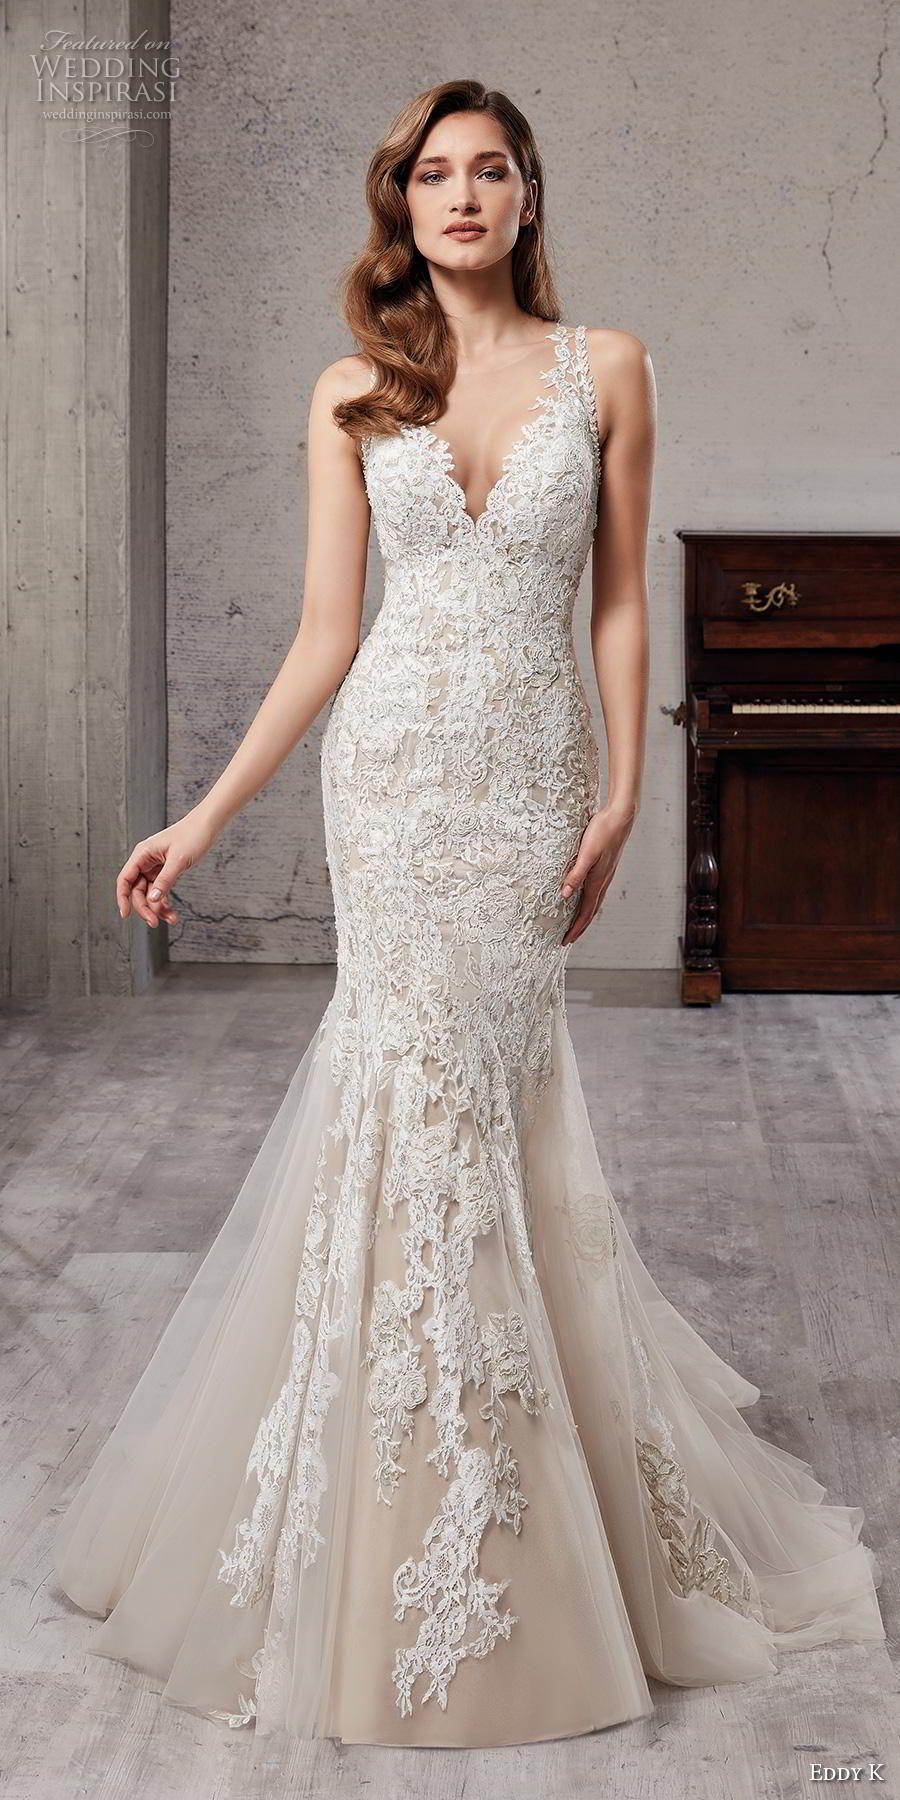 Elegant mermaid wedding dresses  Eddy K Couture  Wedding Dresses  Wedding   Pinterest